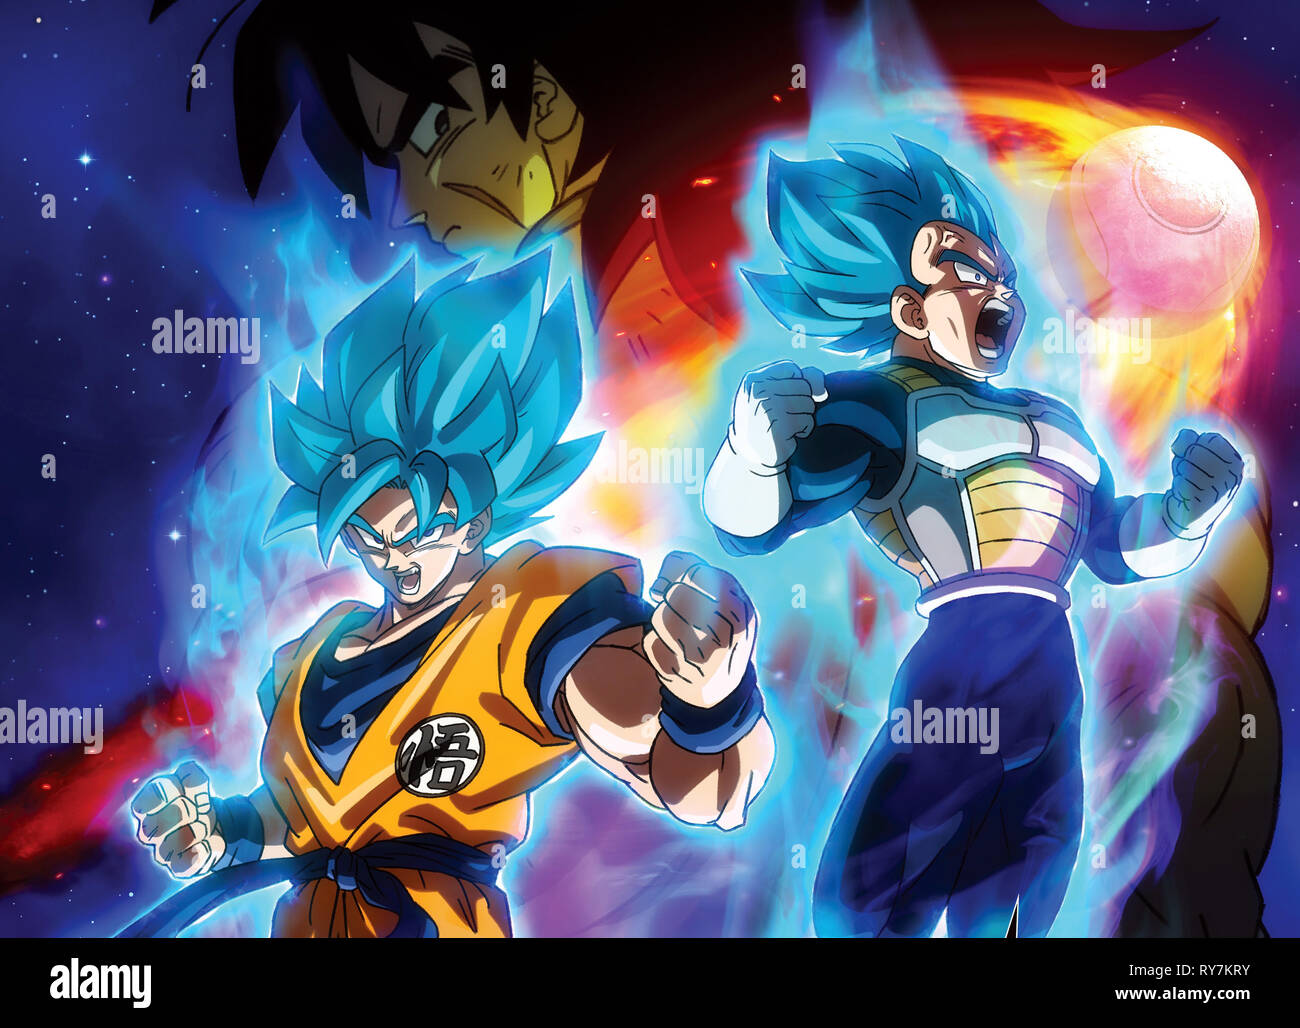 Dragon Ball Super Broly 2018 De Tatsuya Nagamine Visuel Animation